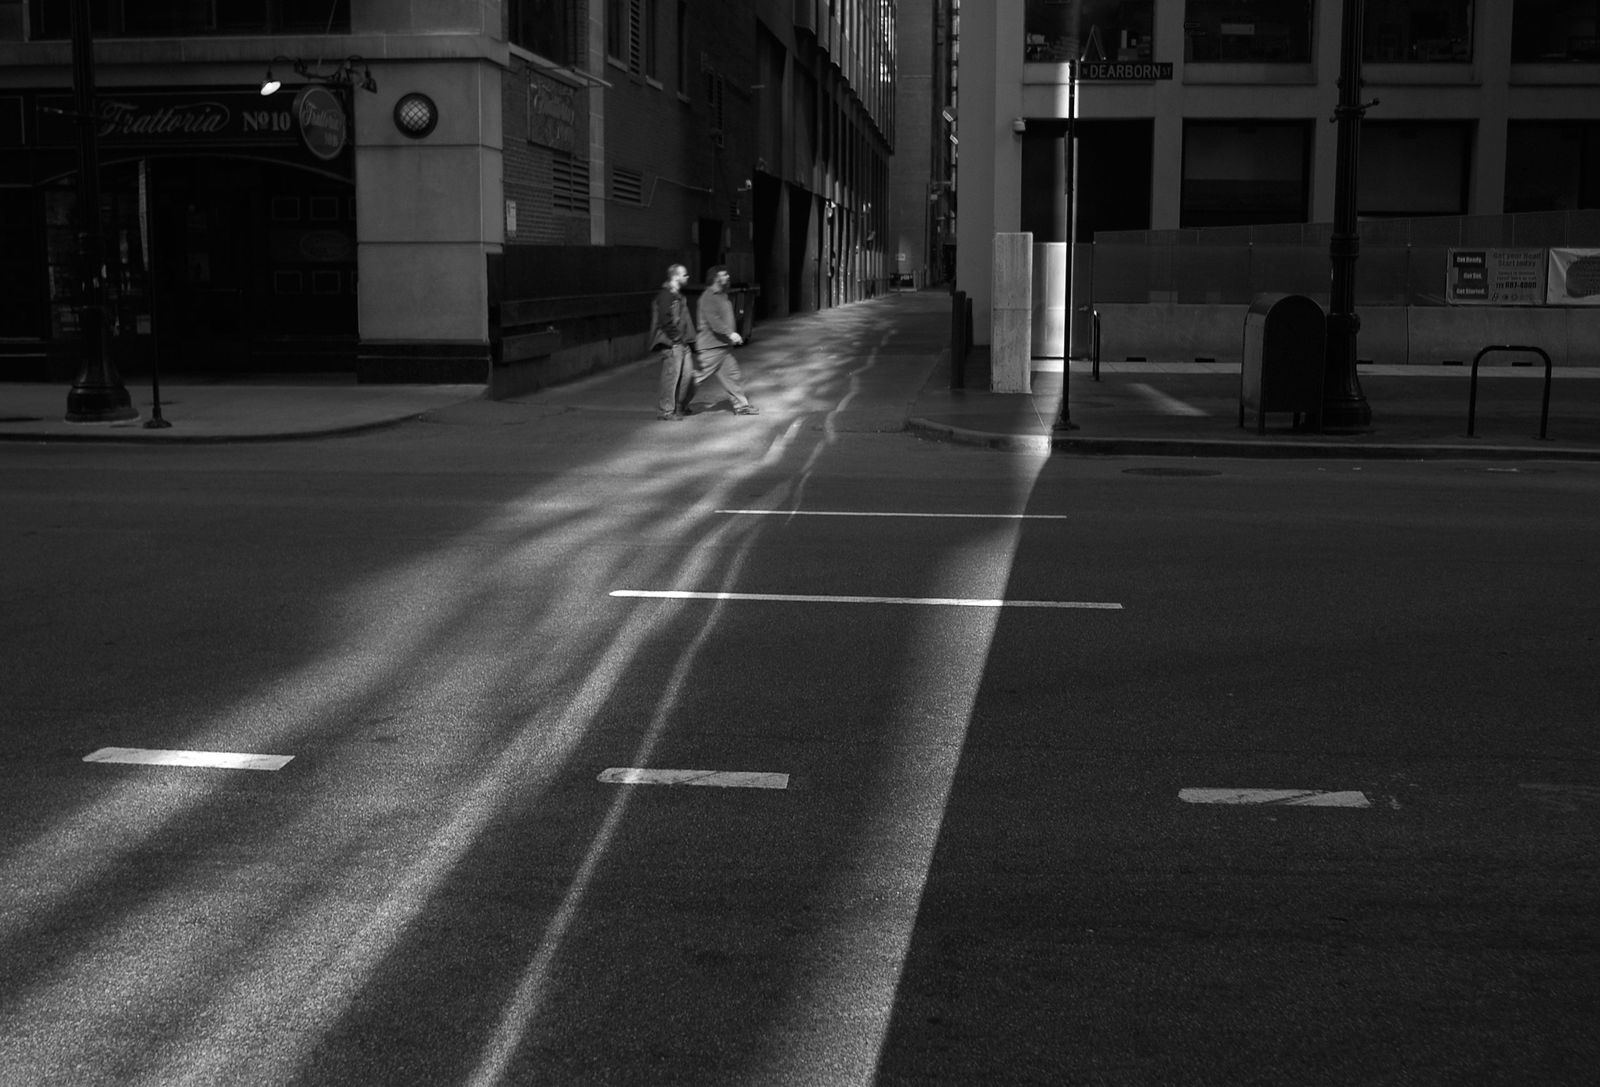 AYUSON_light_peds.jpg